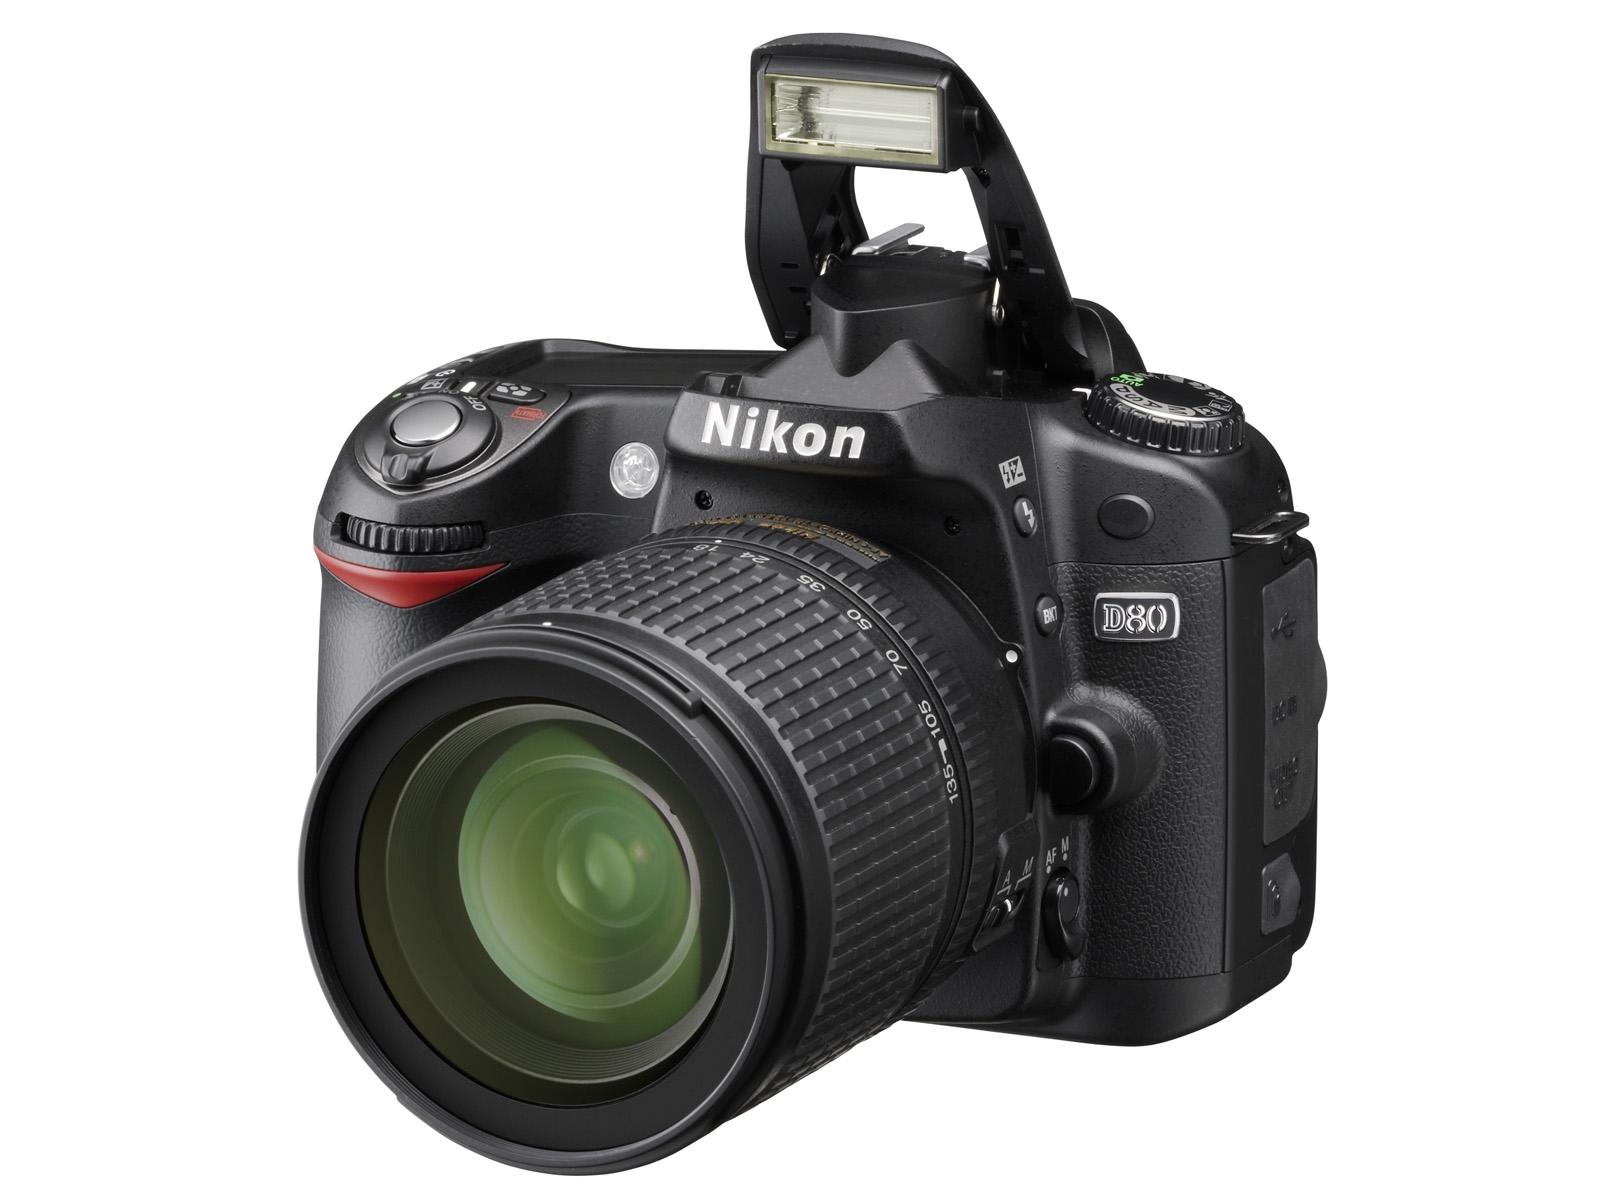 nikon d80 cameras dslr camera photographers reflex 1000 under professional juzaphoto quality